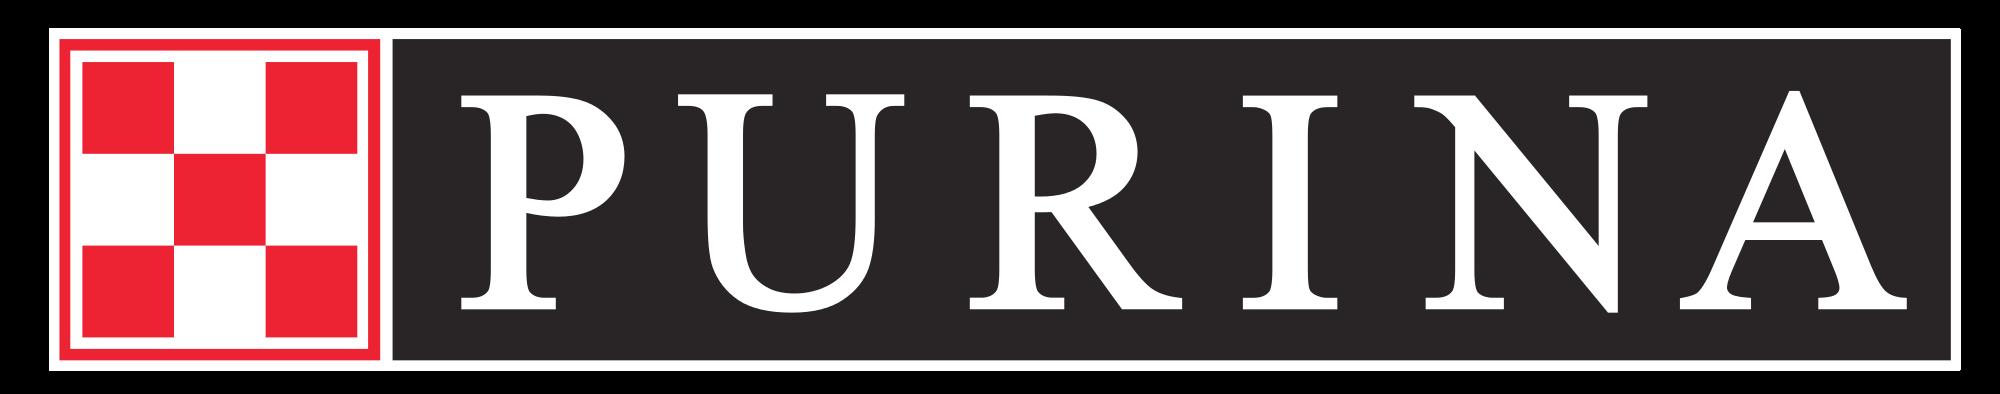 Purina-logo.png